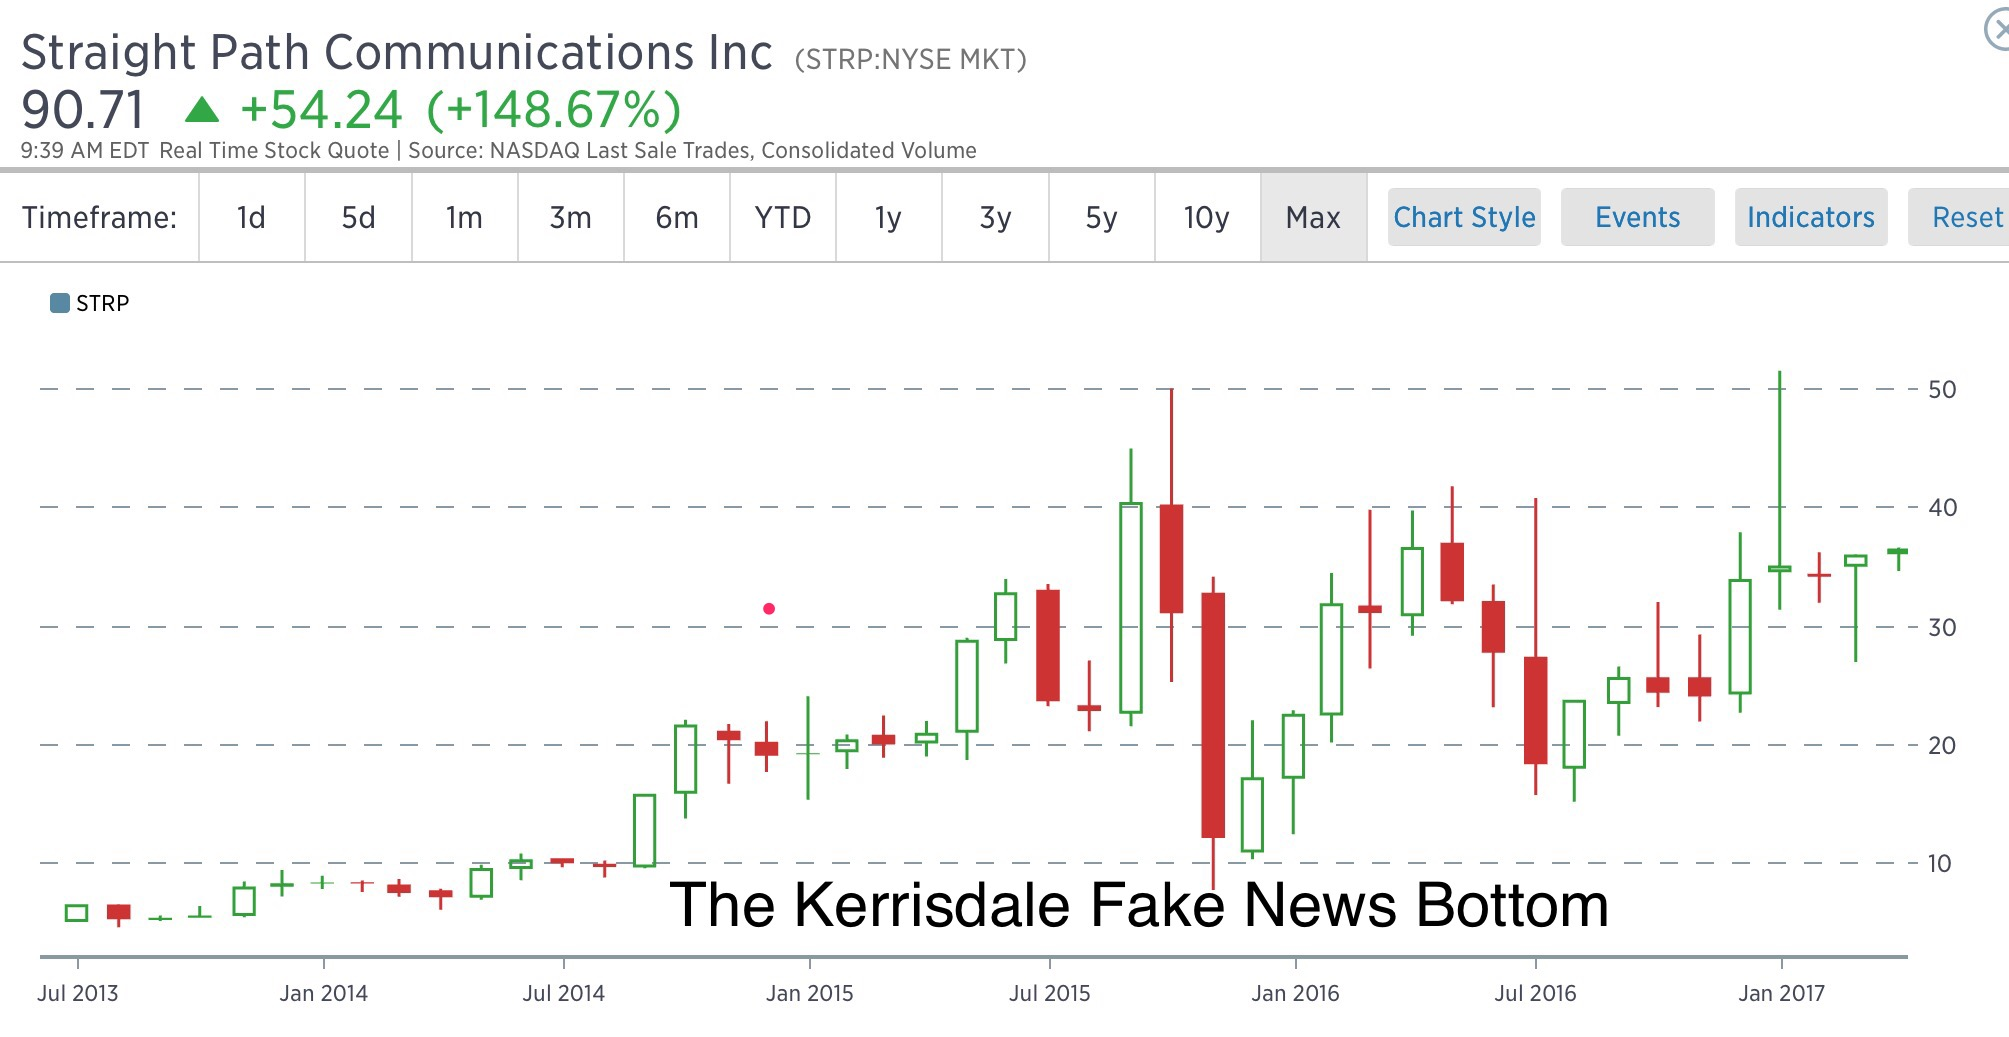 At&t Stock Quote Kerrisdale Beatdown $Strp Acquired For Mega Premium  Trading